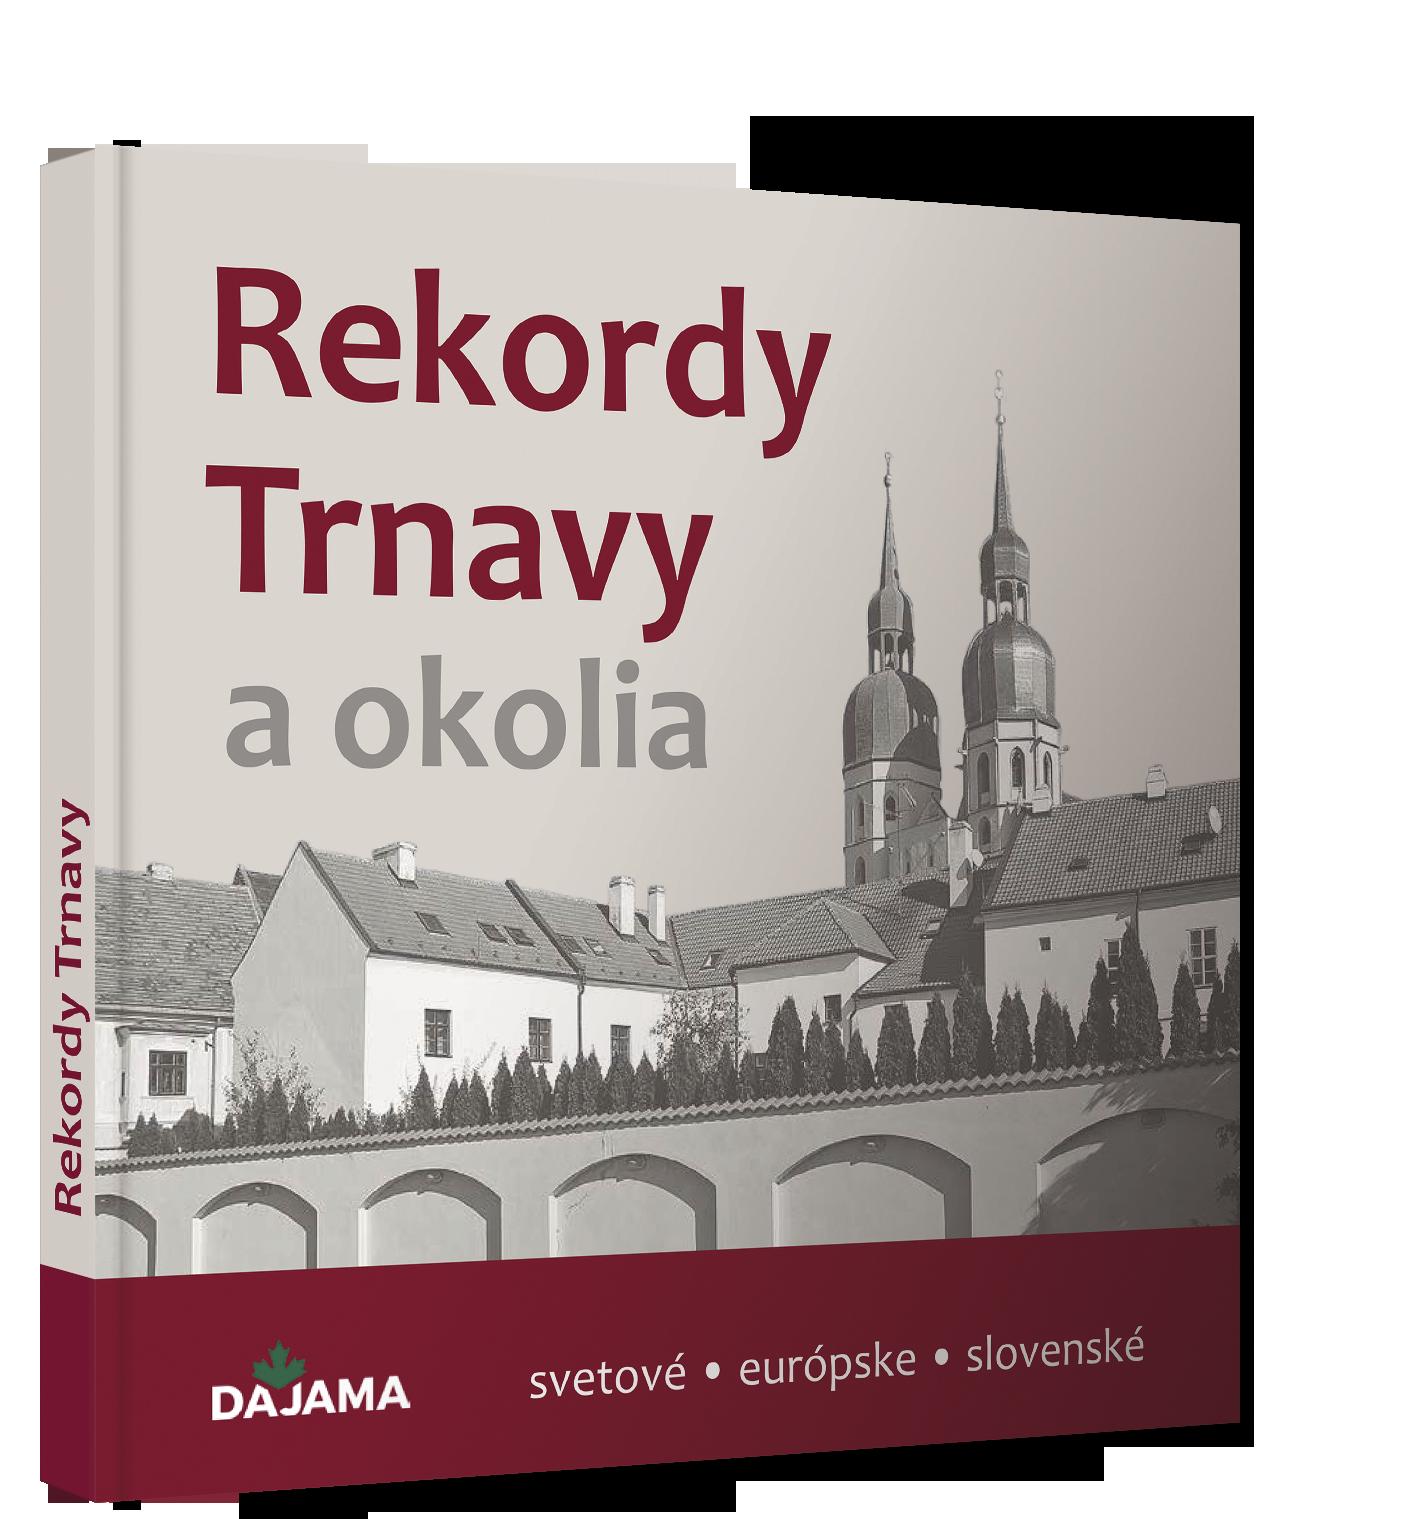 publikace Rekordy Trnavy a okolia